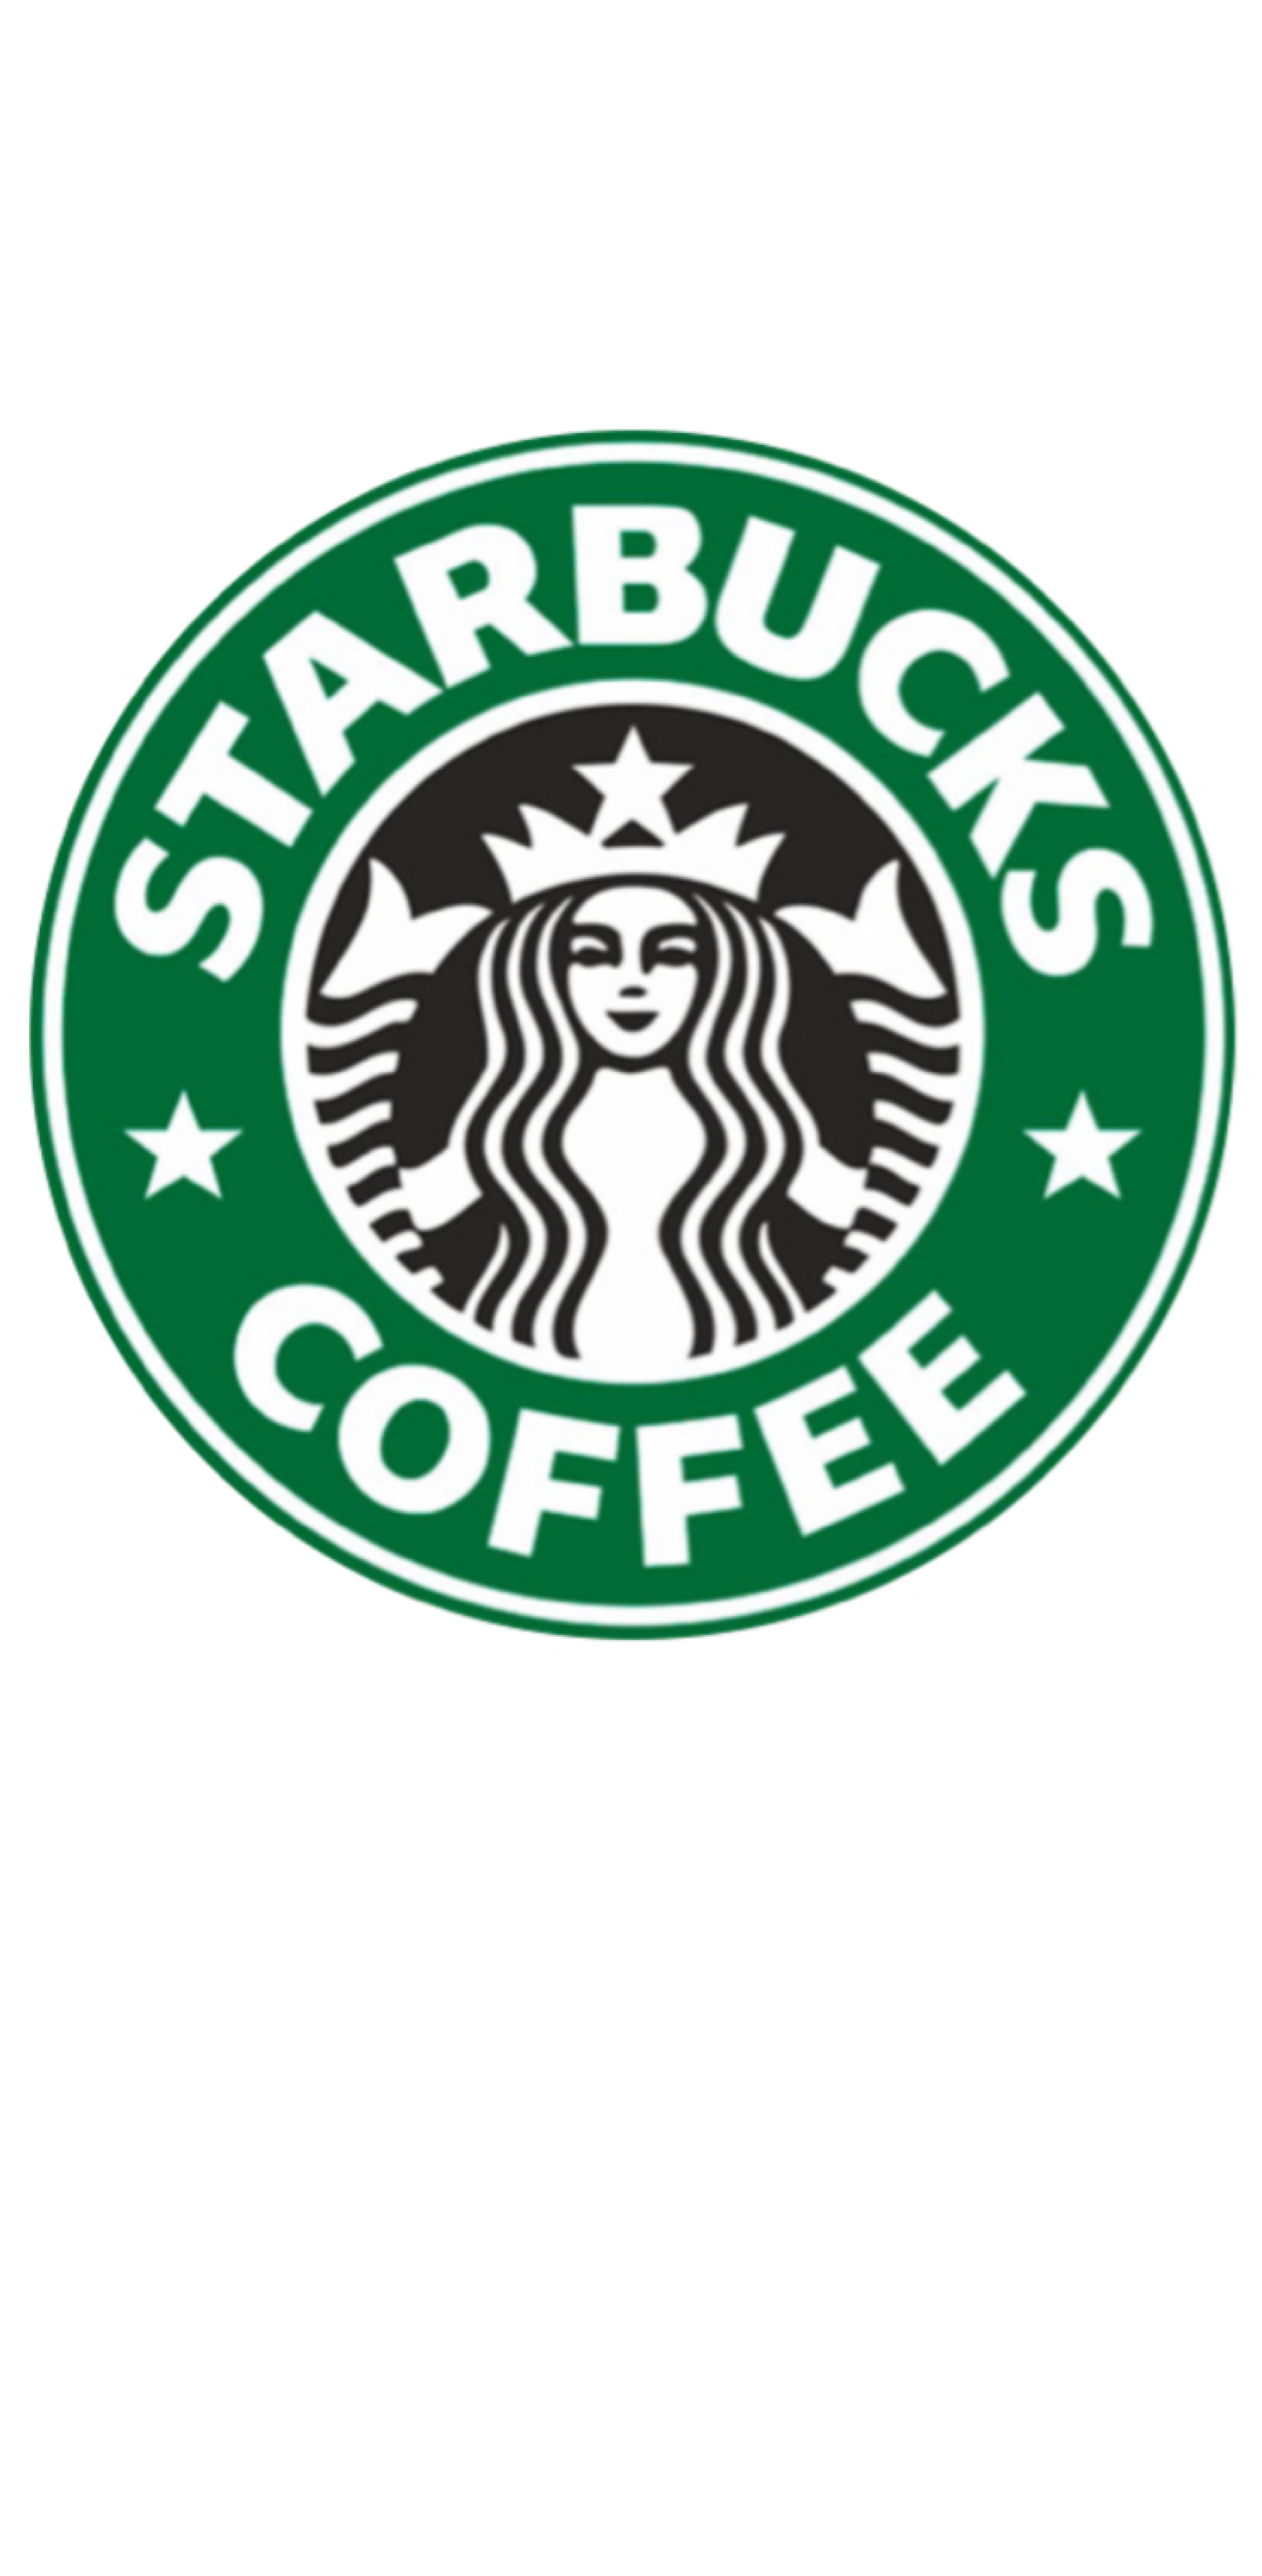 cover Starbucks coffee